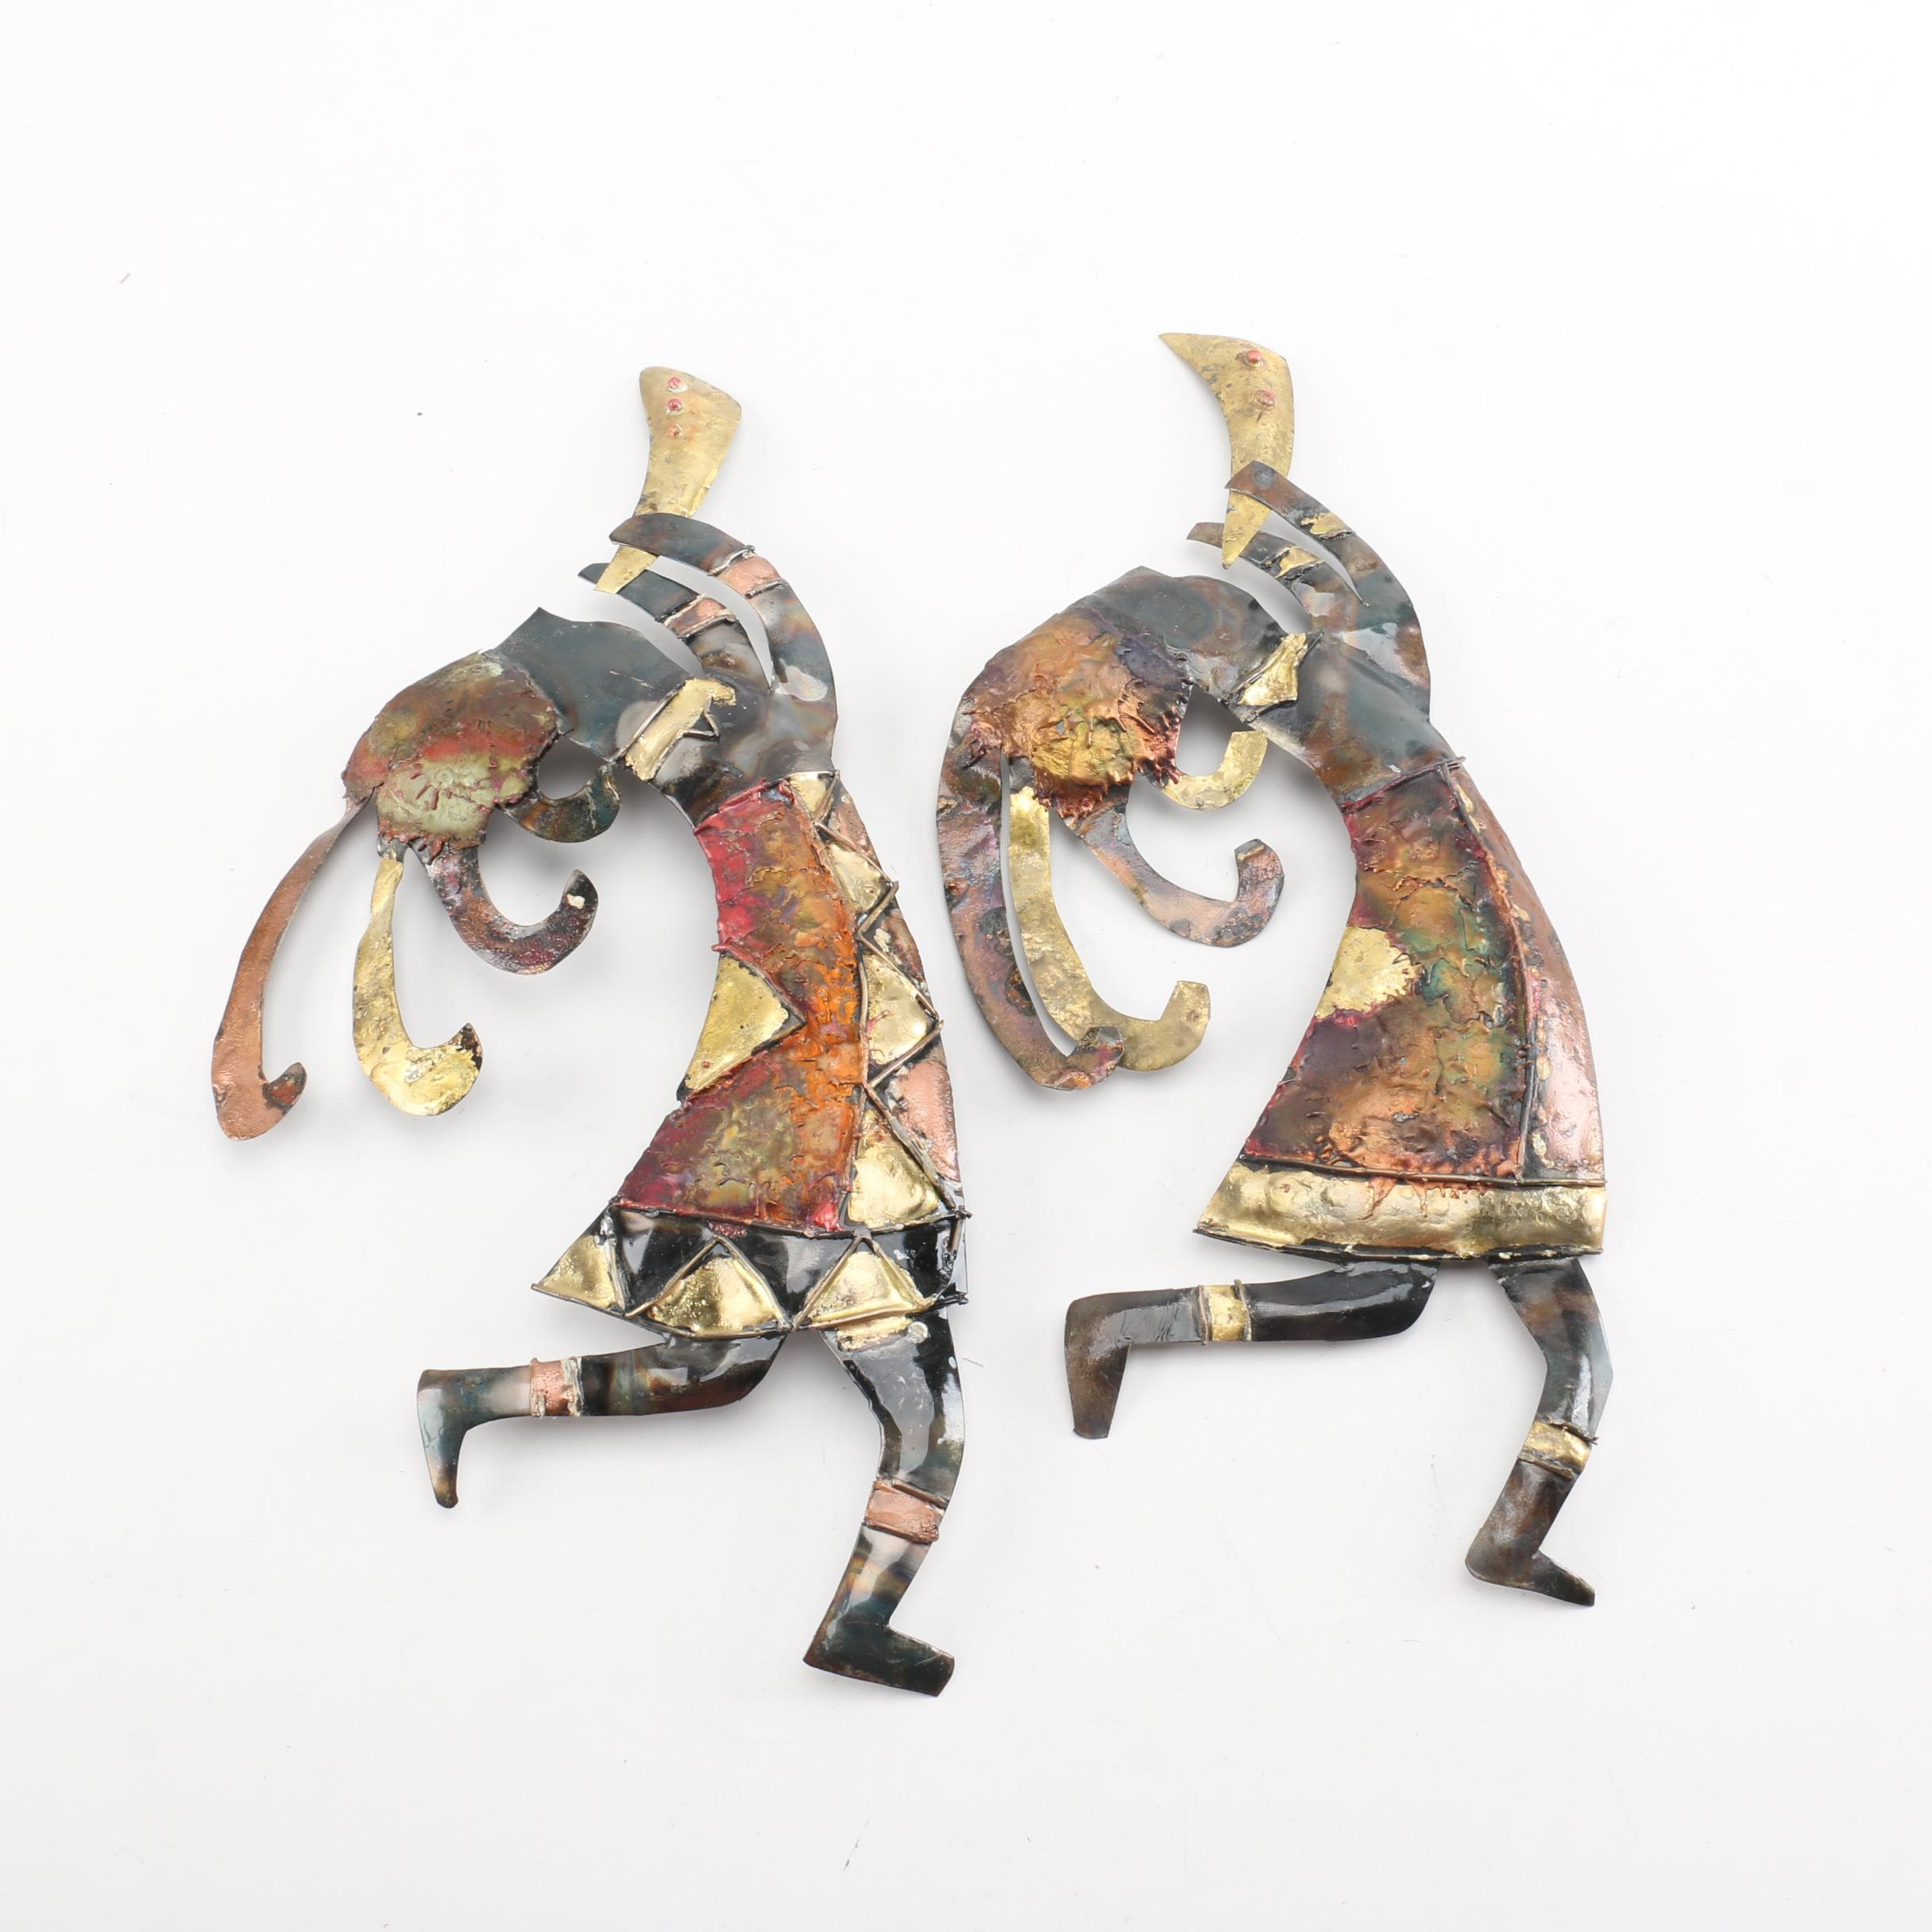 Decorative Metal Wall Figurines